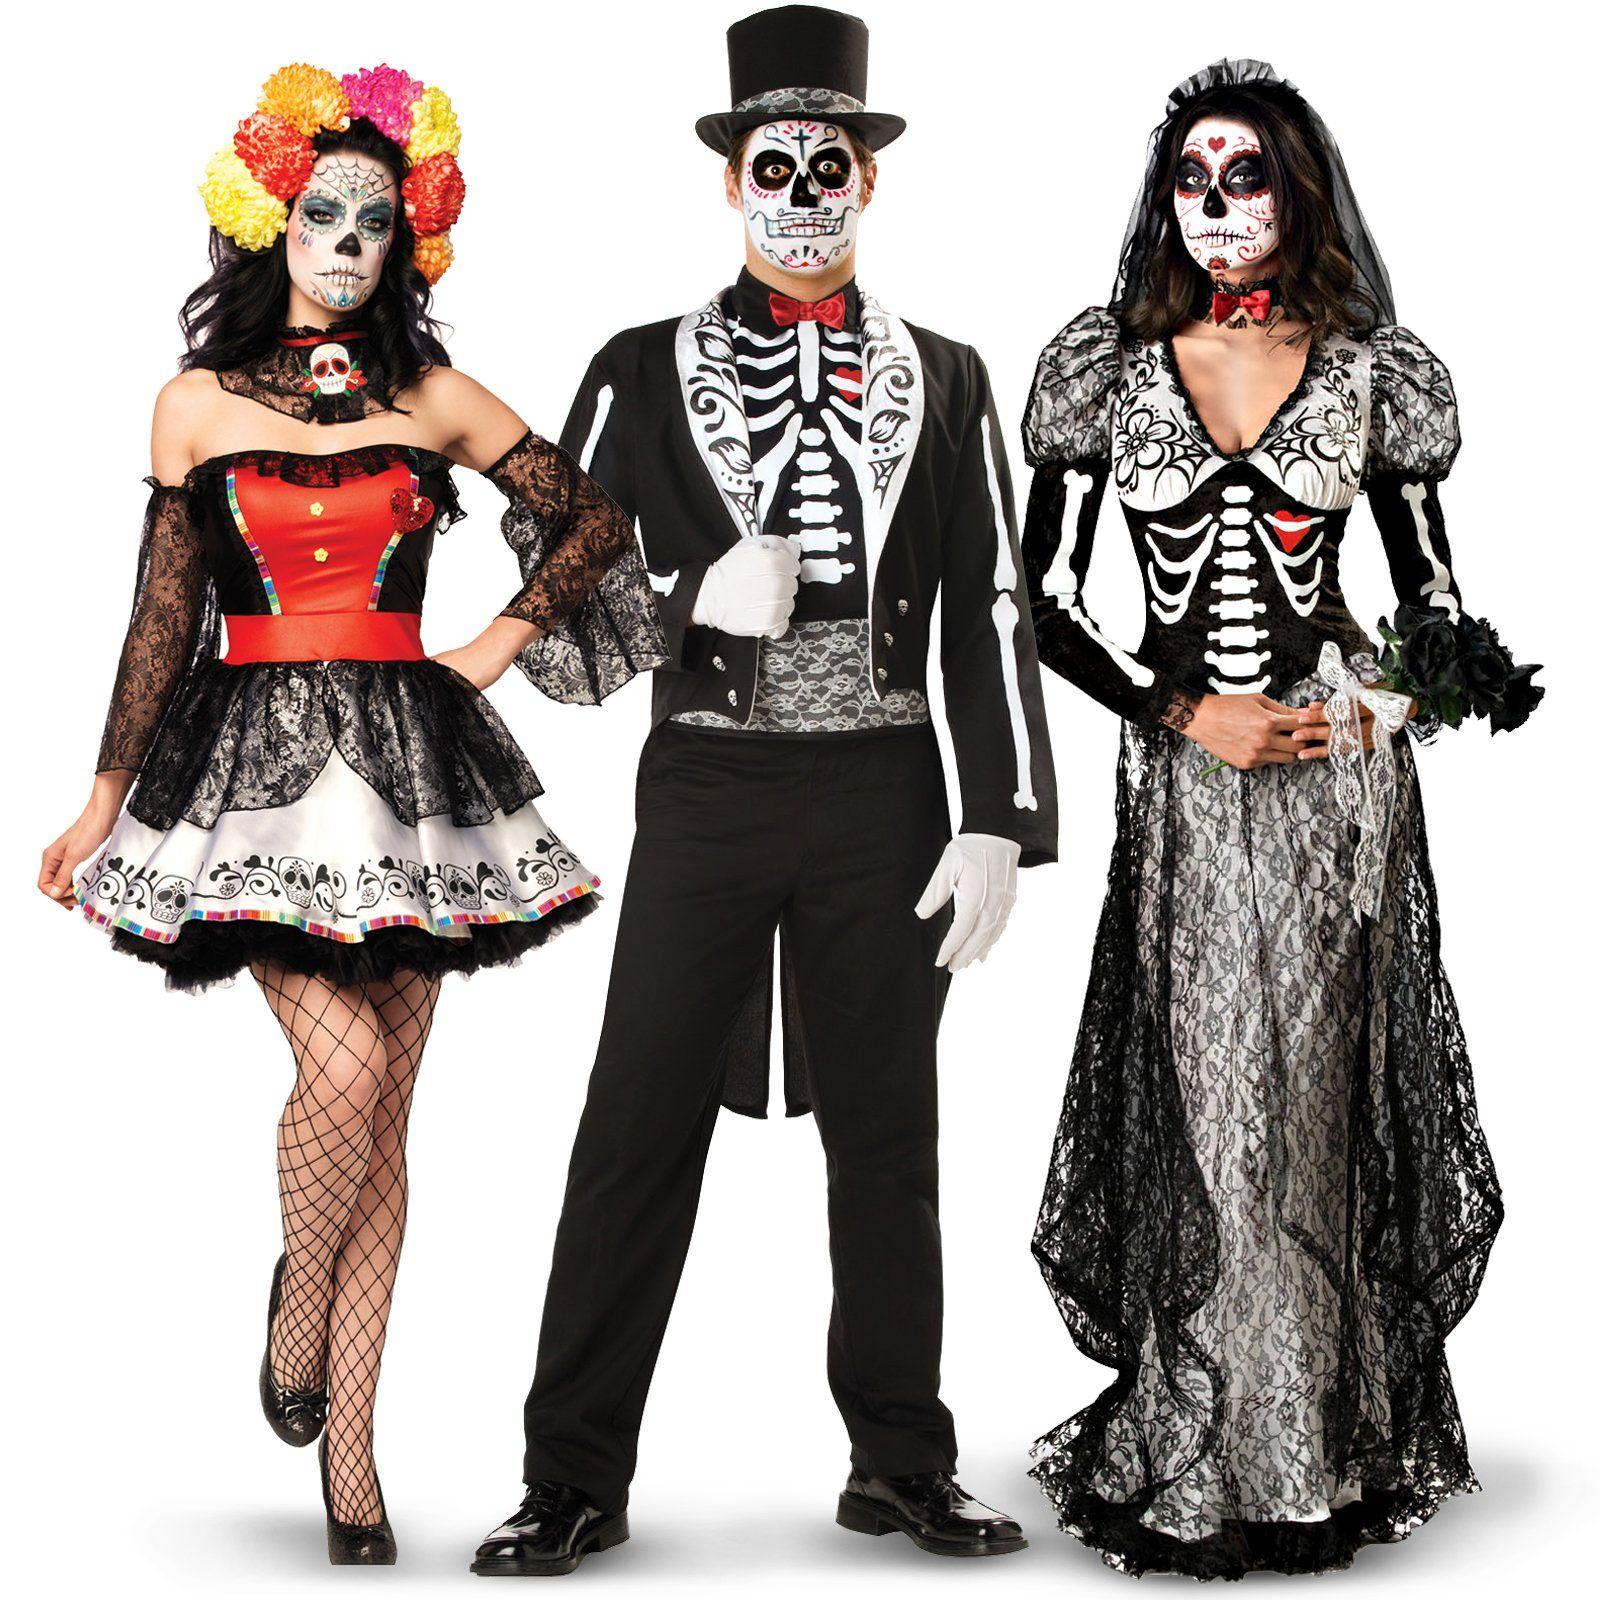 10 Fabulous Day Of The Dead Dress Ideas day of the dead outfits day of the dead outfits day of the dead 2020